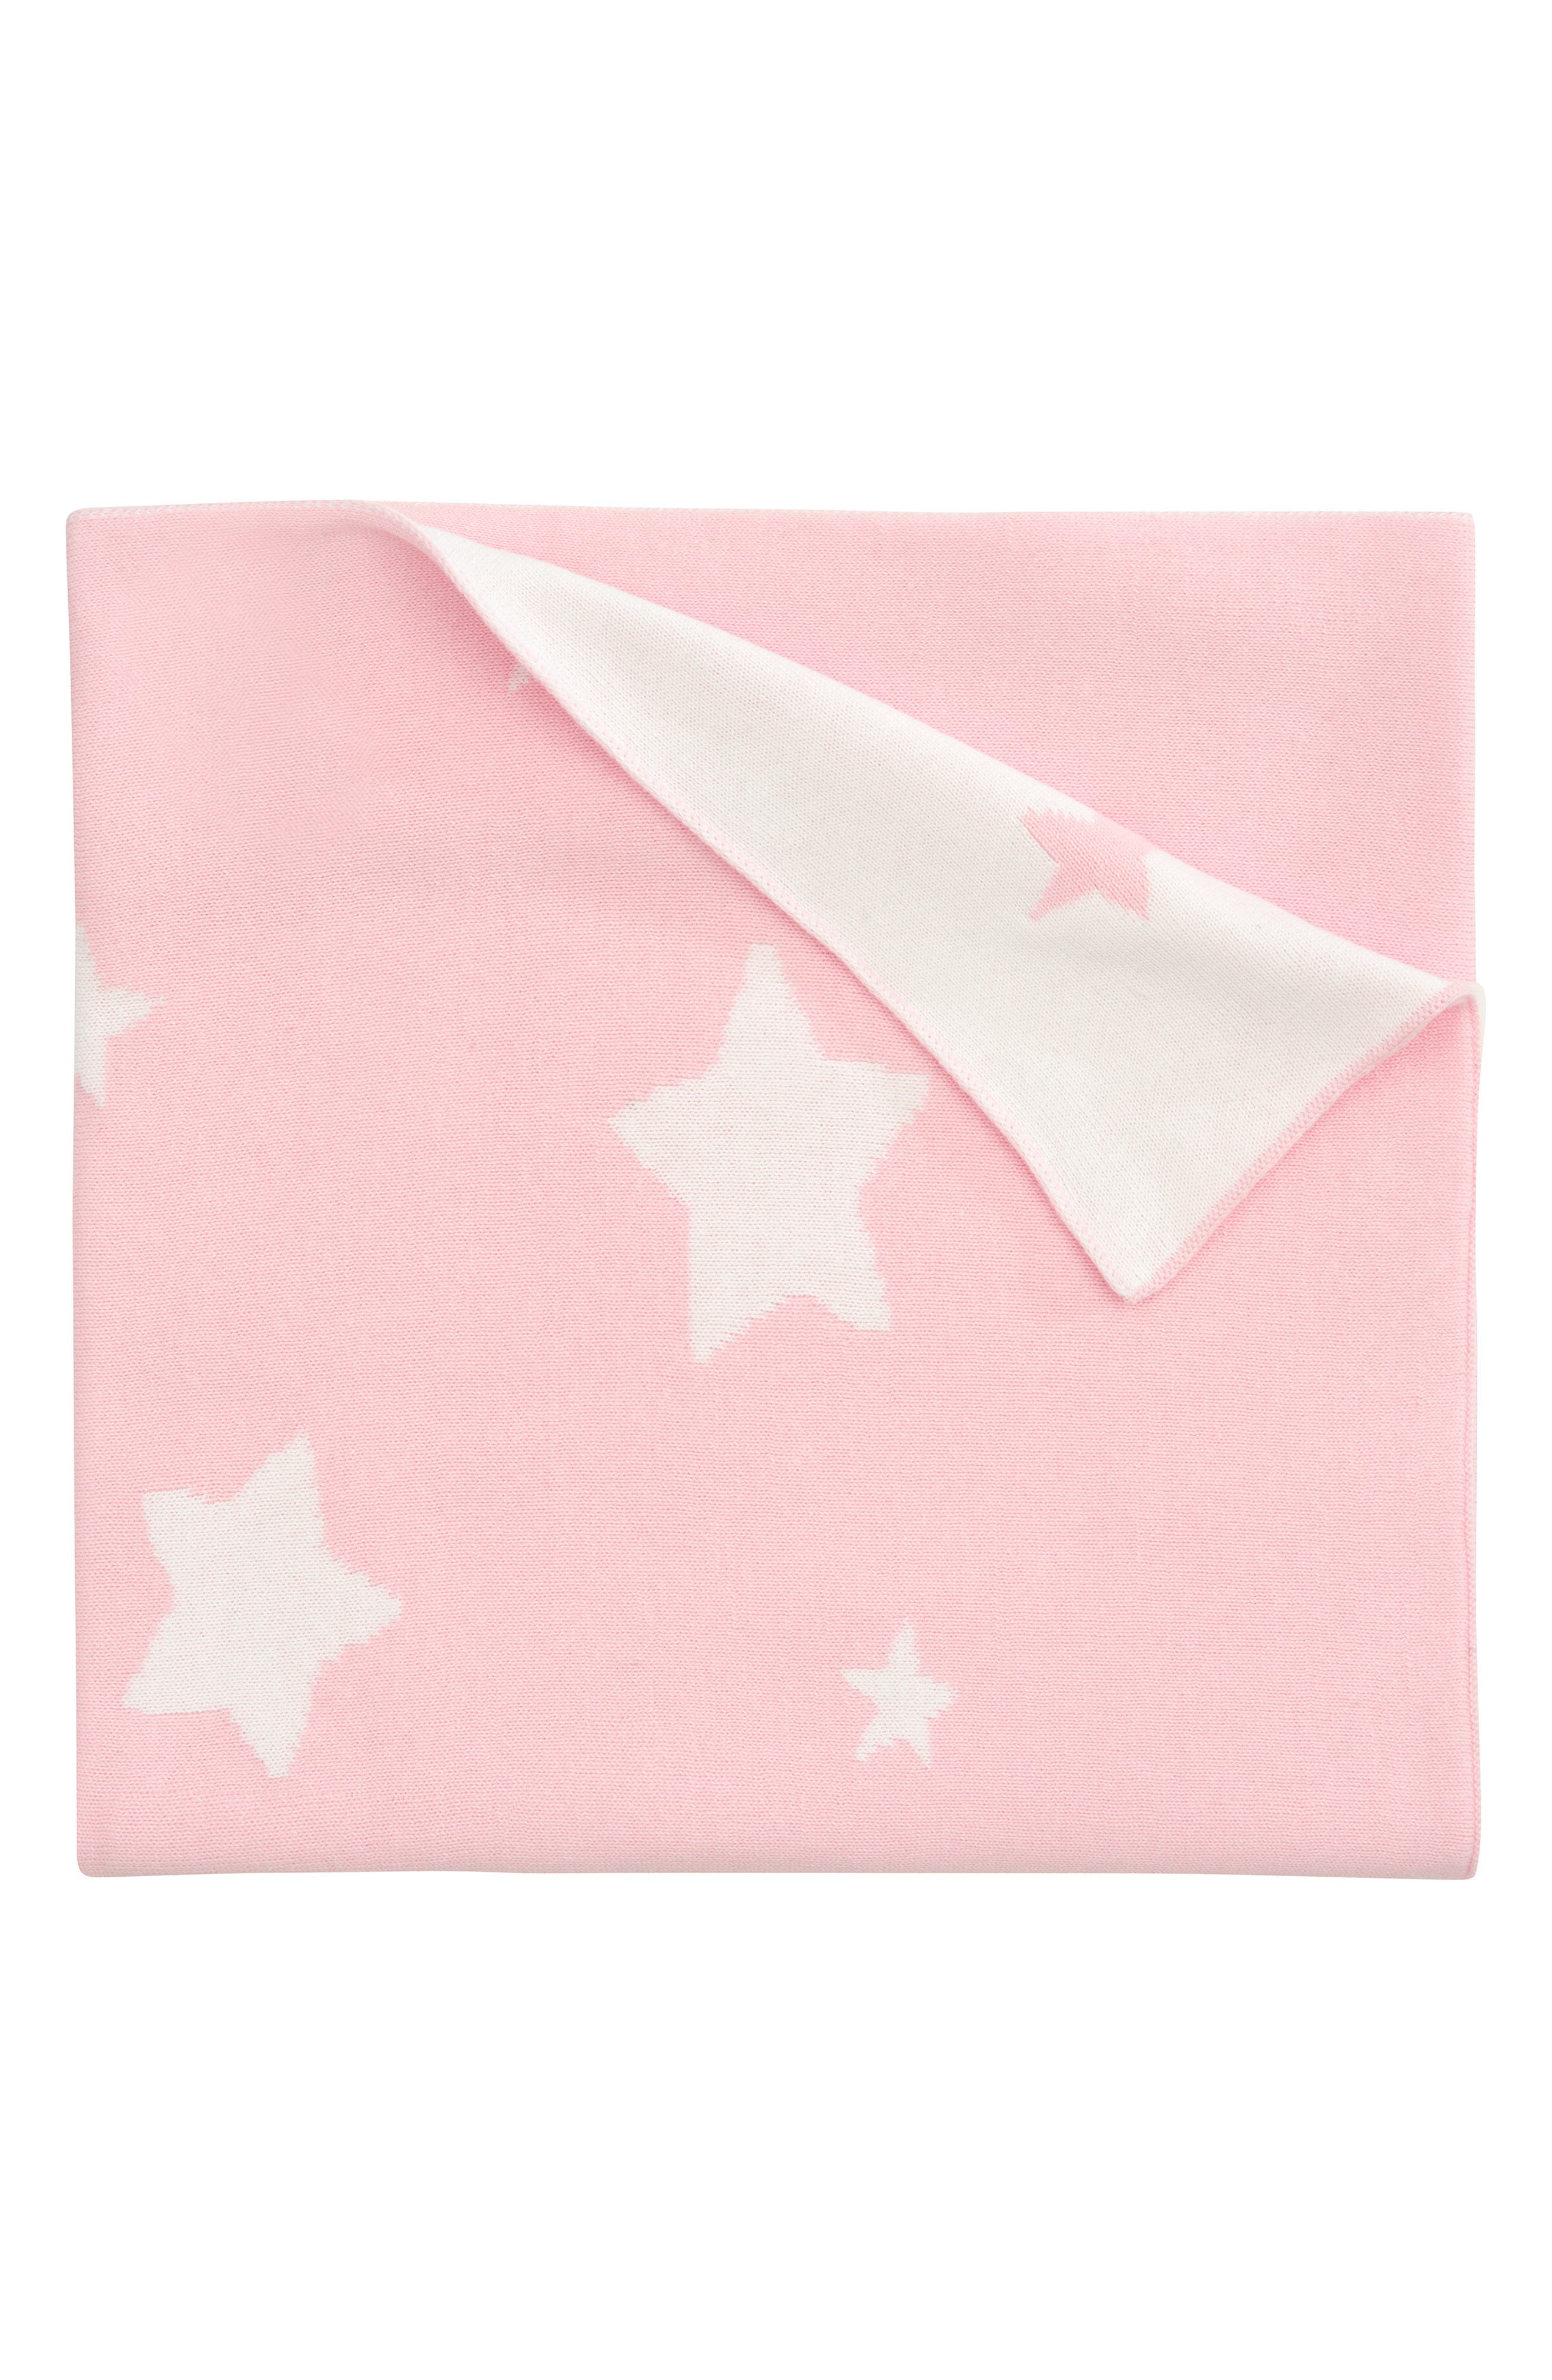 'Star' Knit Blanket,                             Main thumbnail 1, color,                             Light Pink